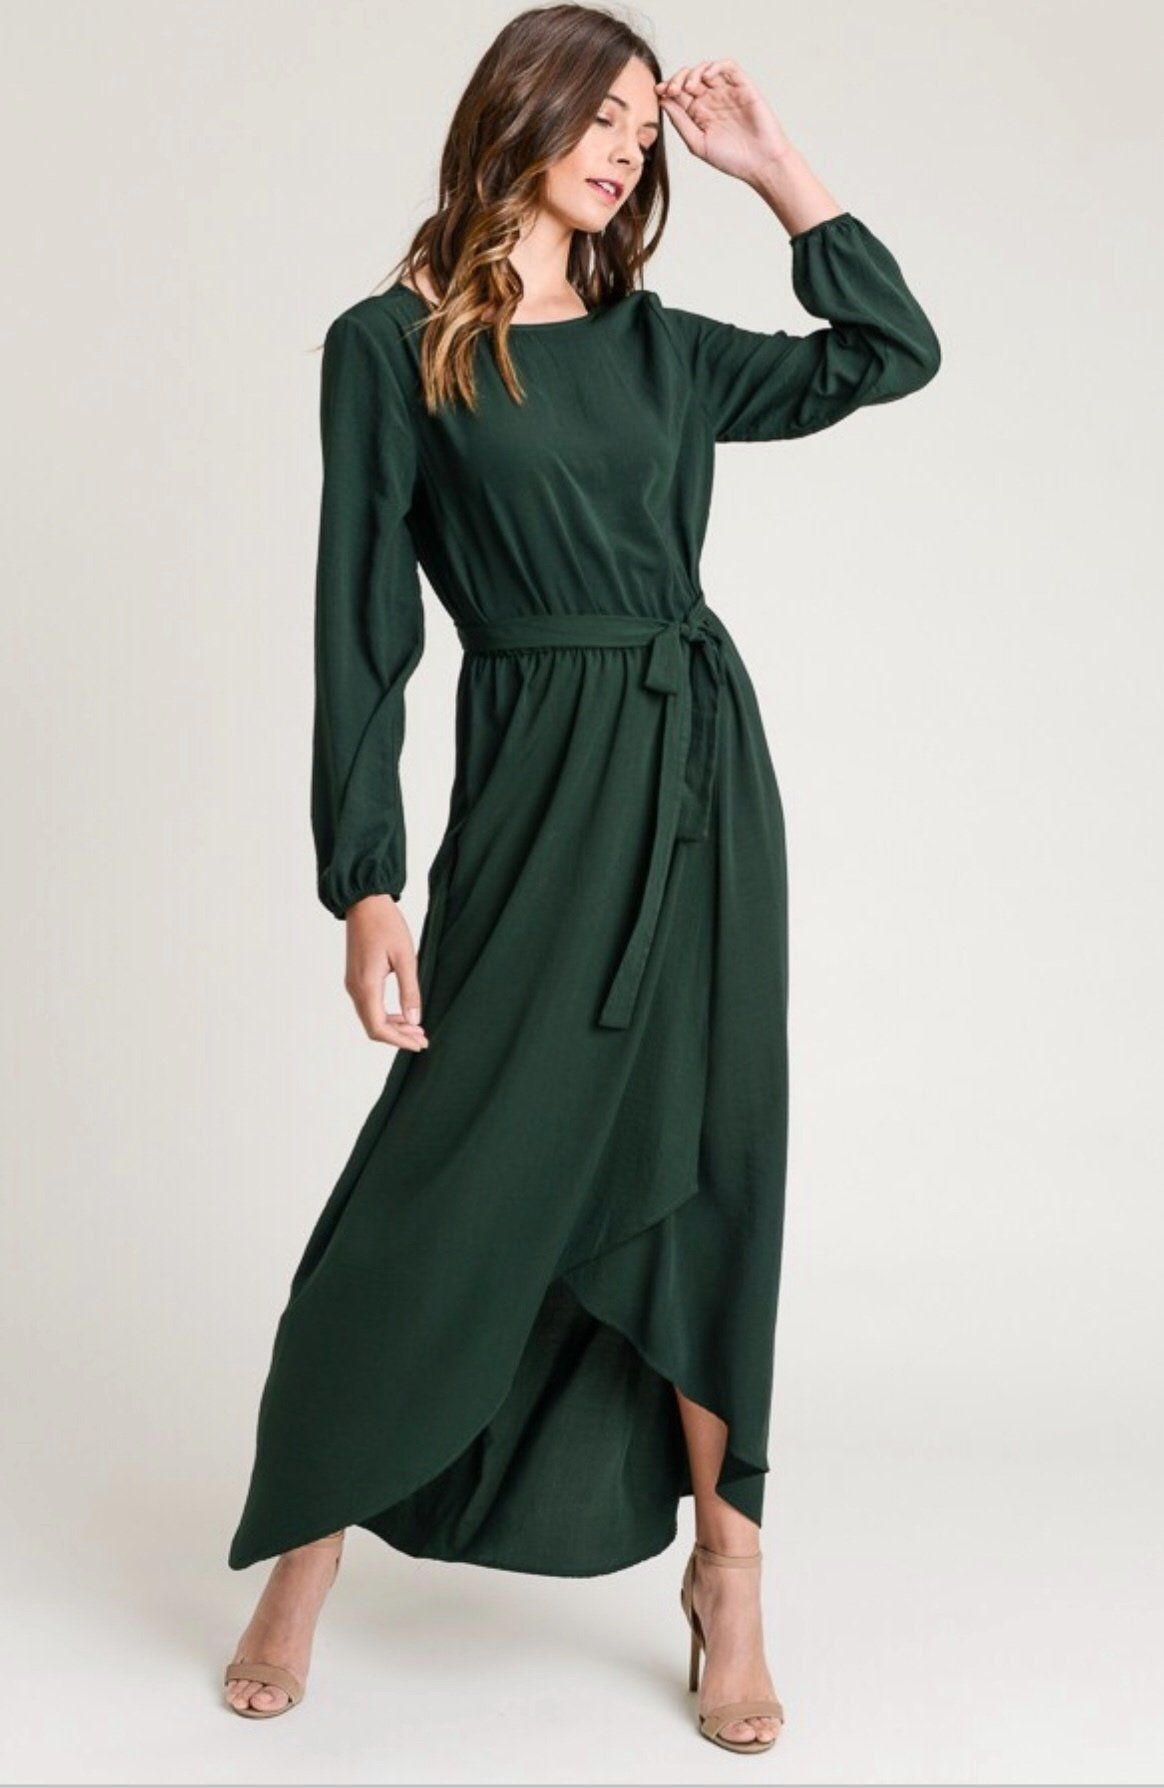 Brooklyn dress evergreen modest dresses dresses